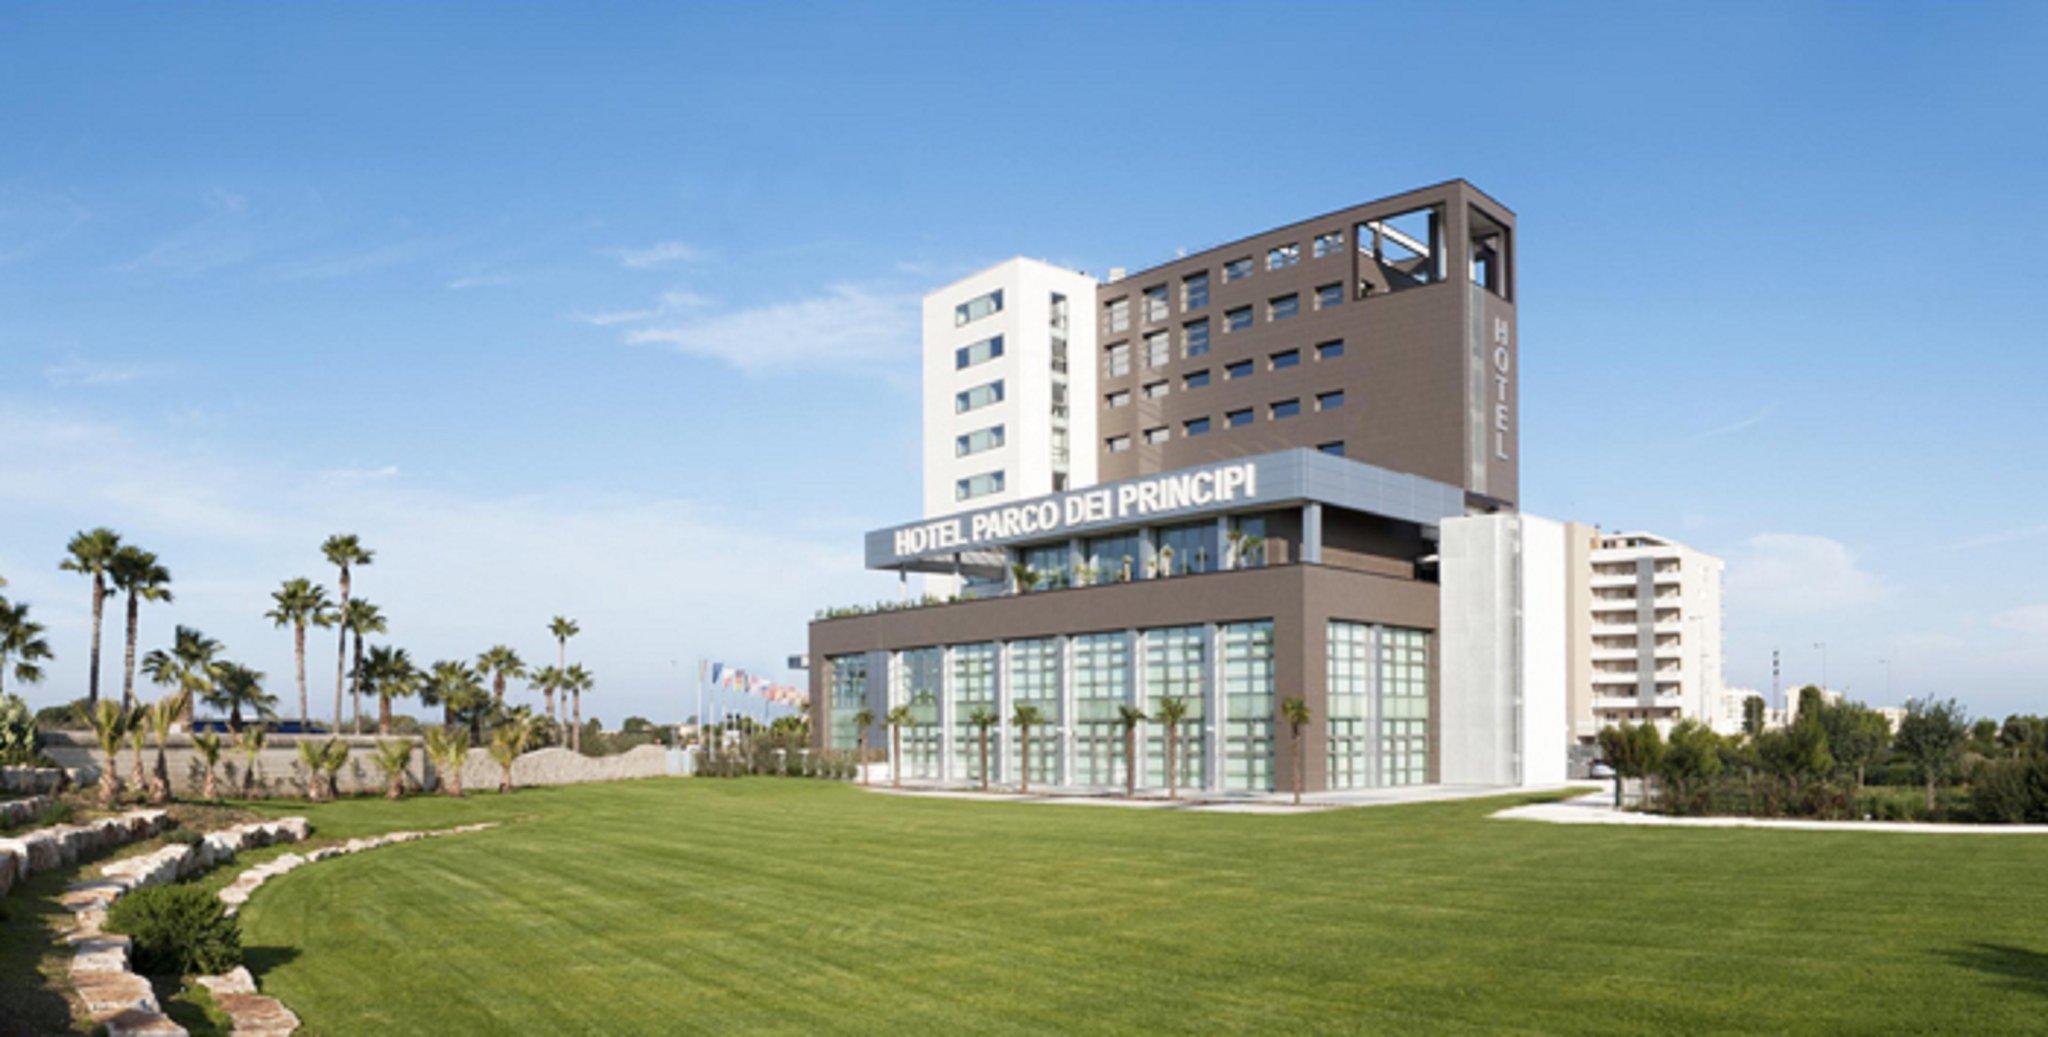 Parco dei Principi Hotel Congress SPA